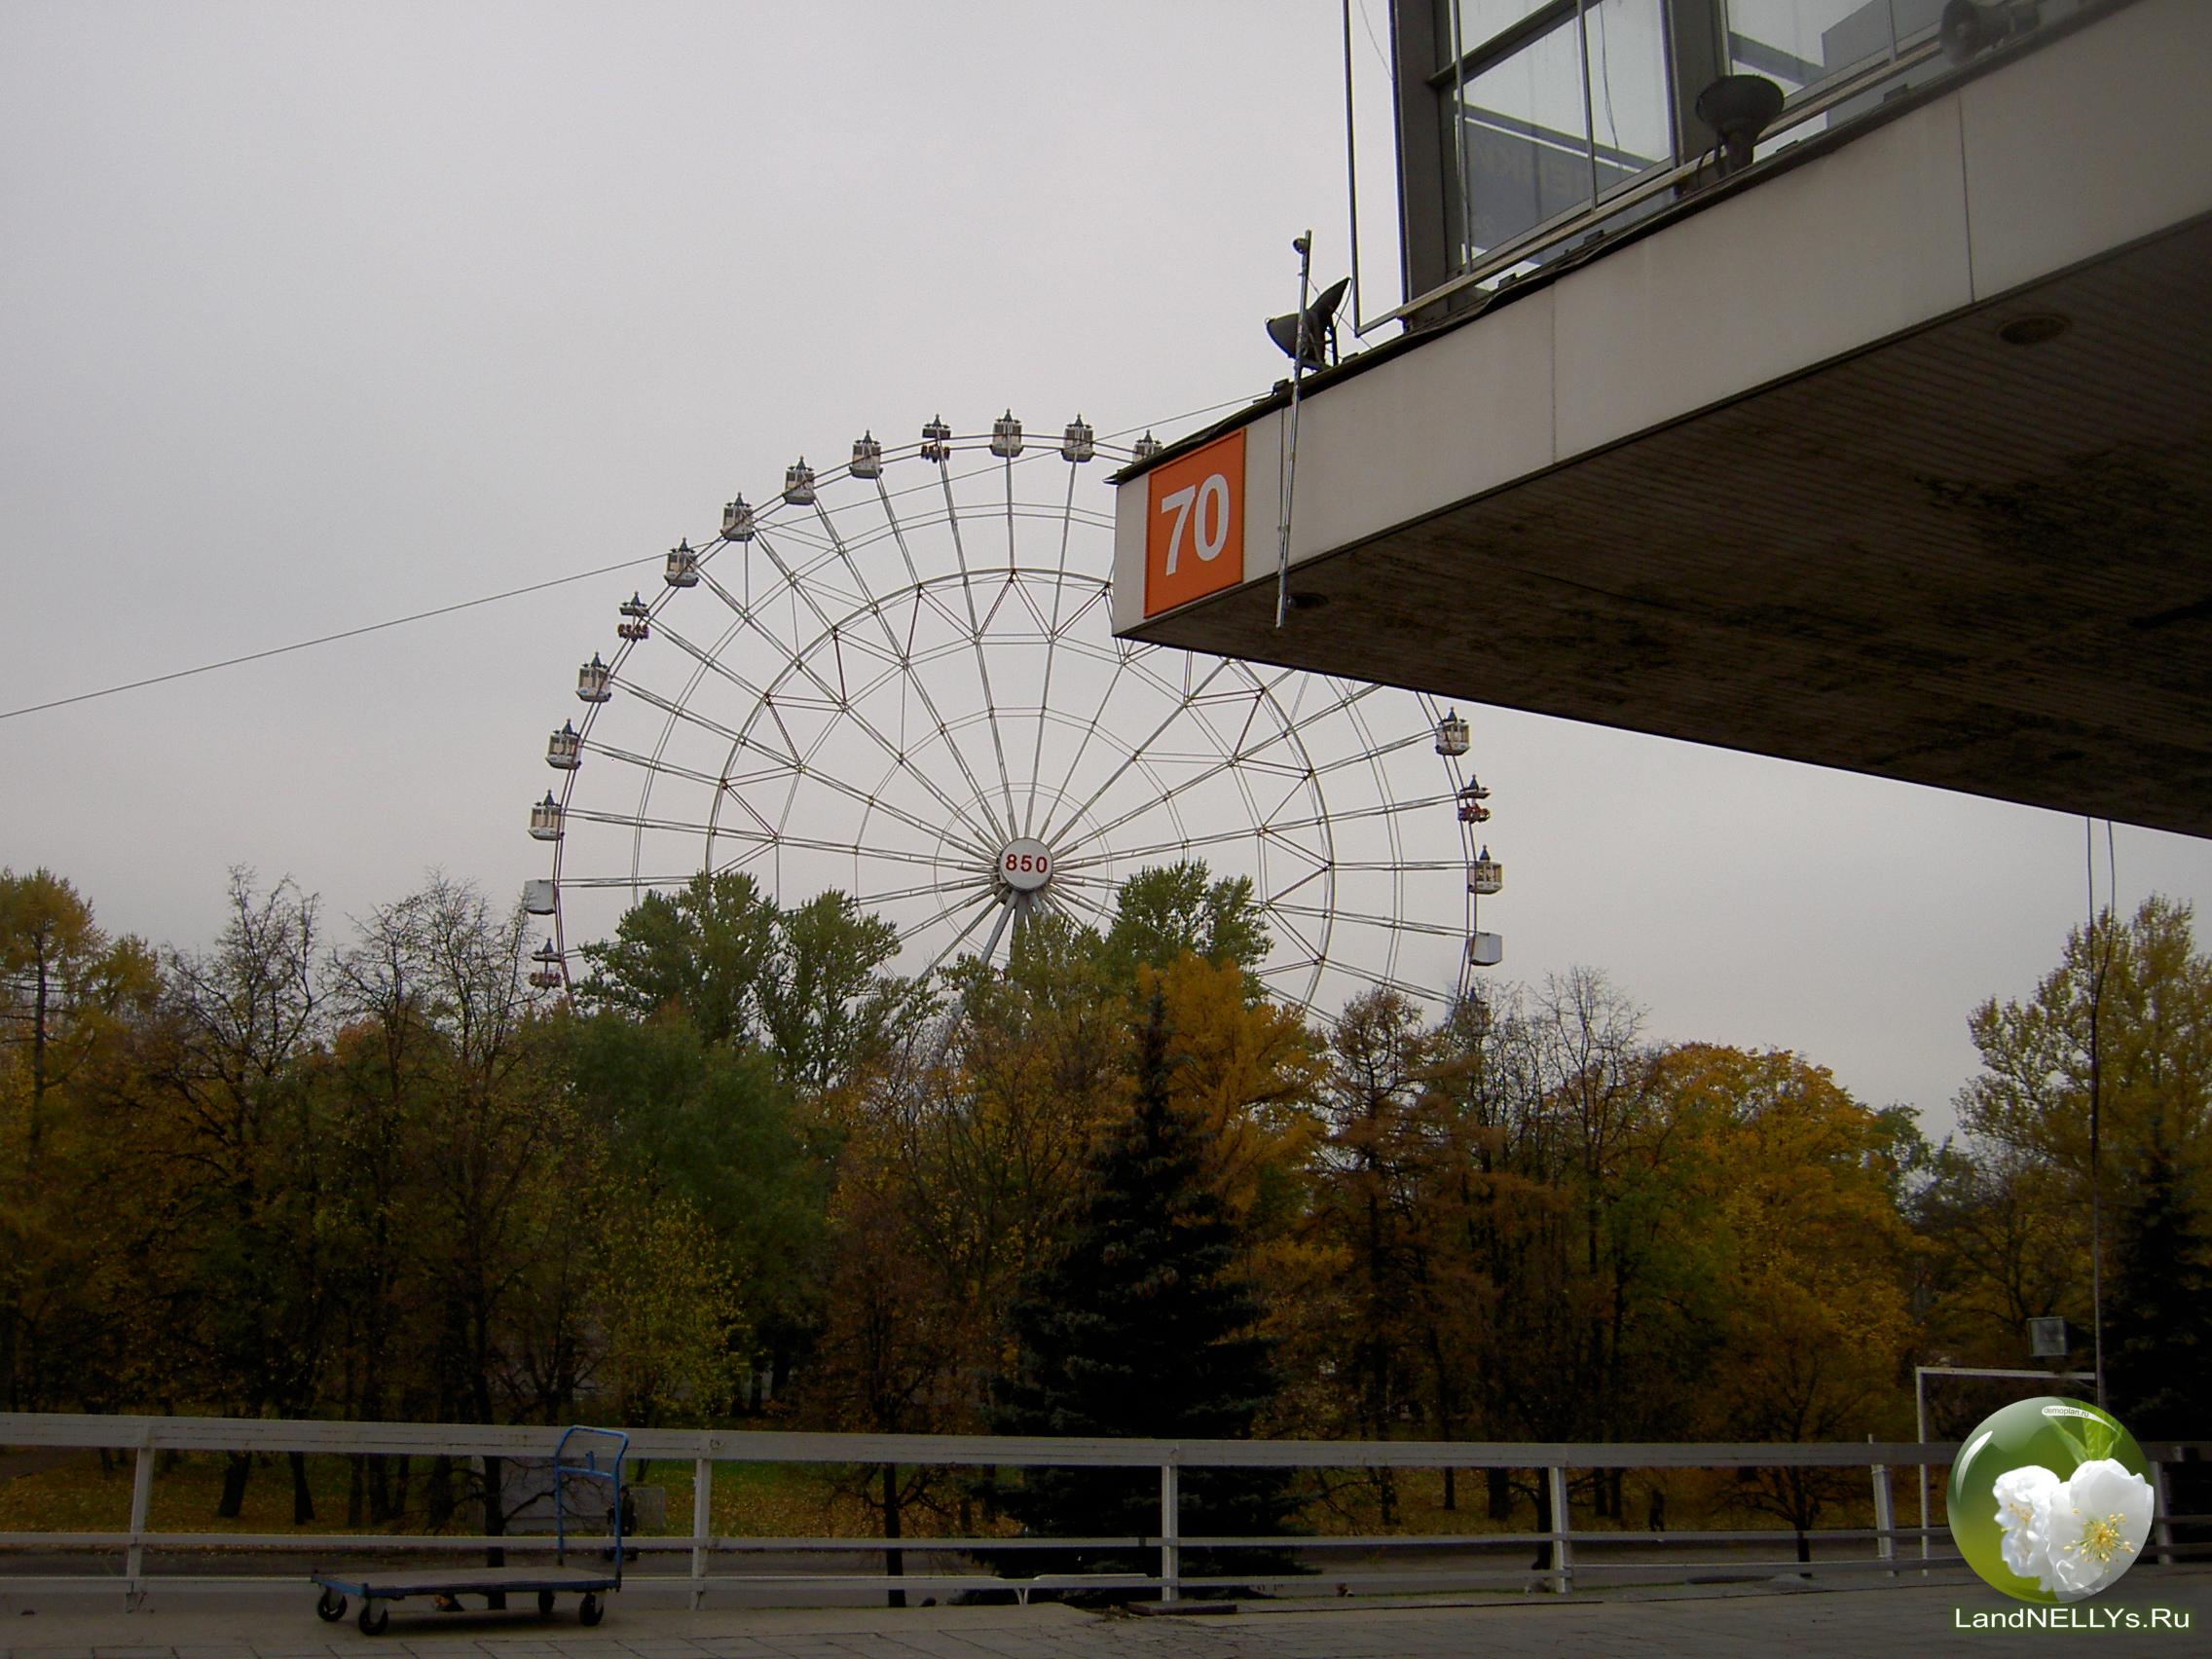 вднх павильон 70 Москва